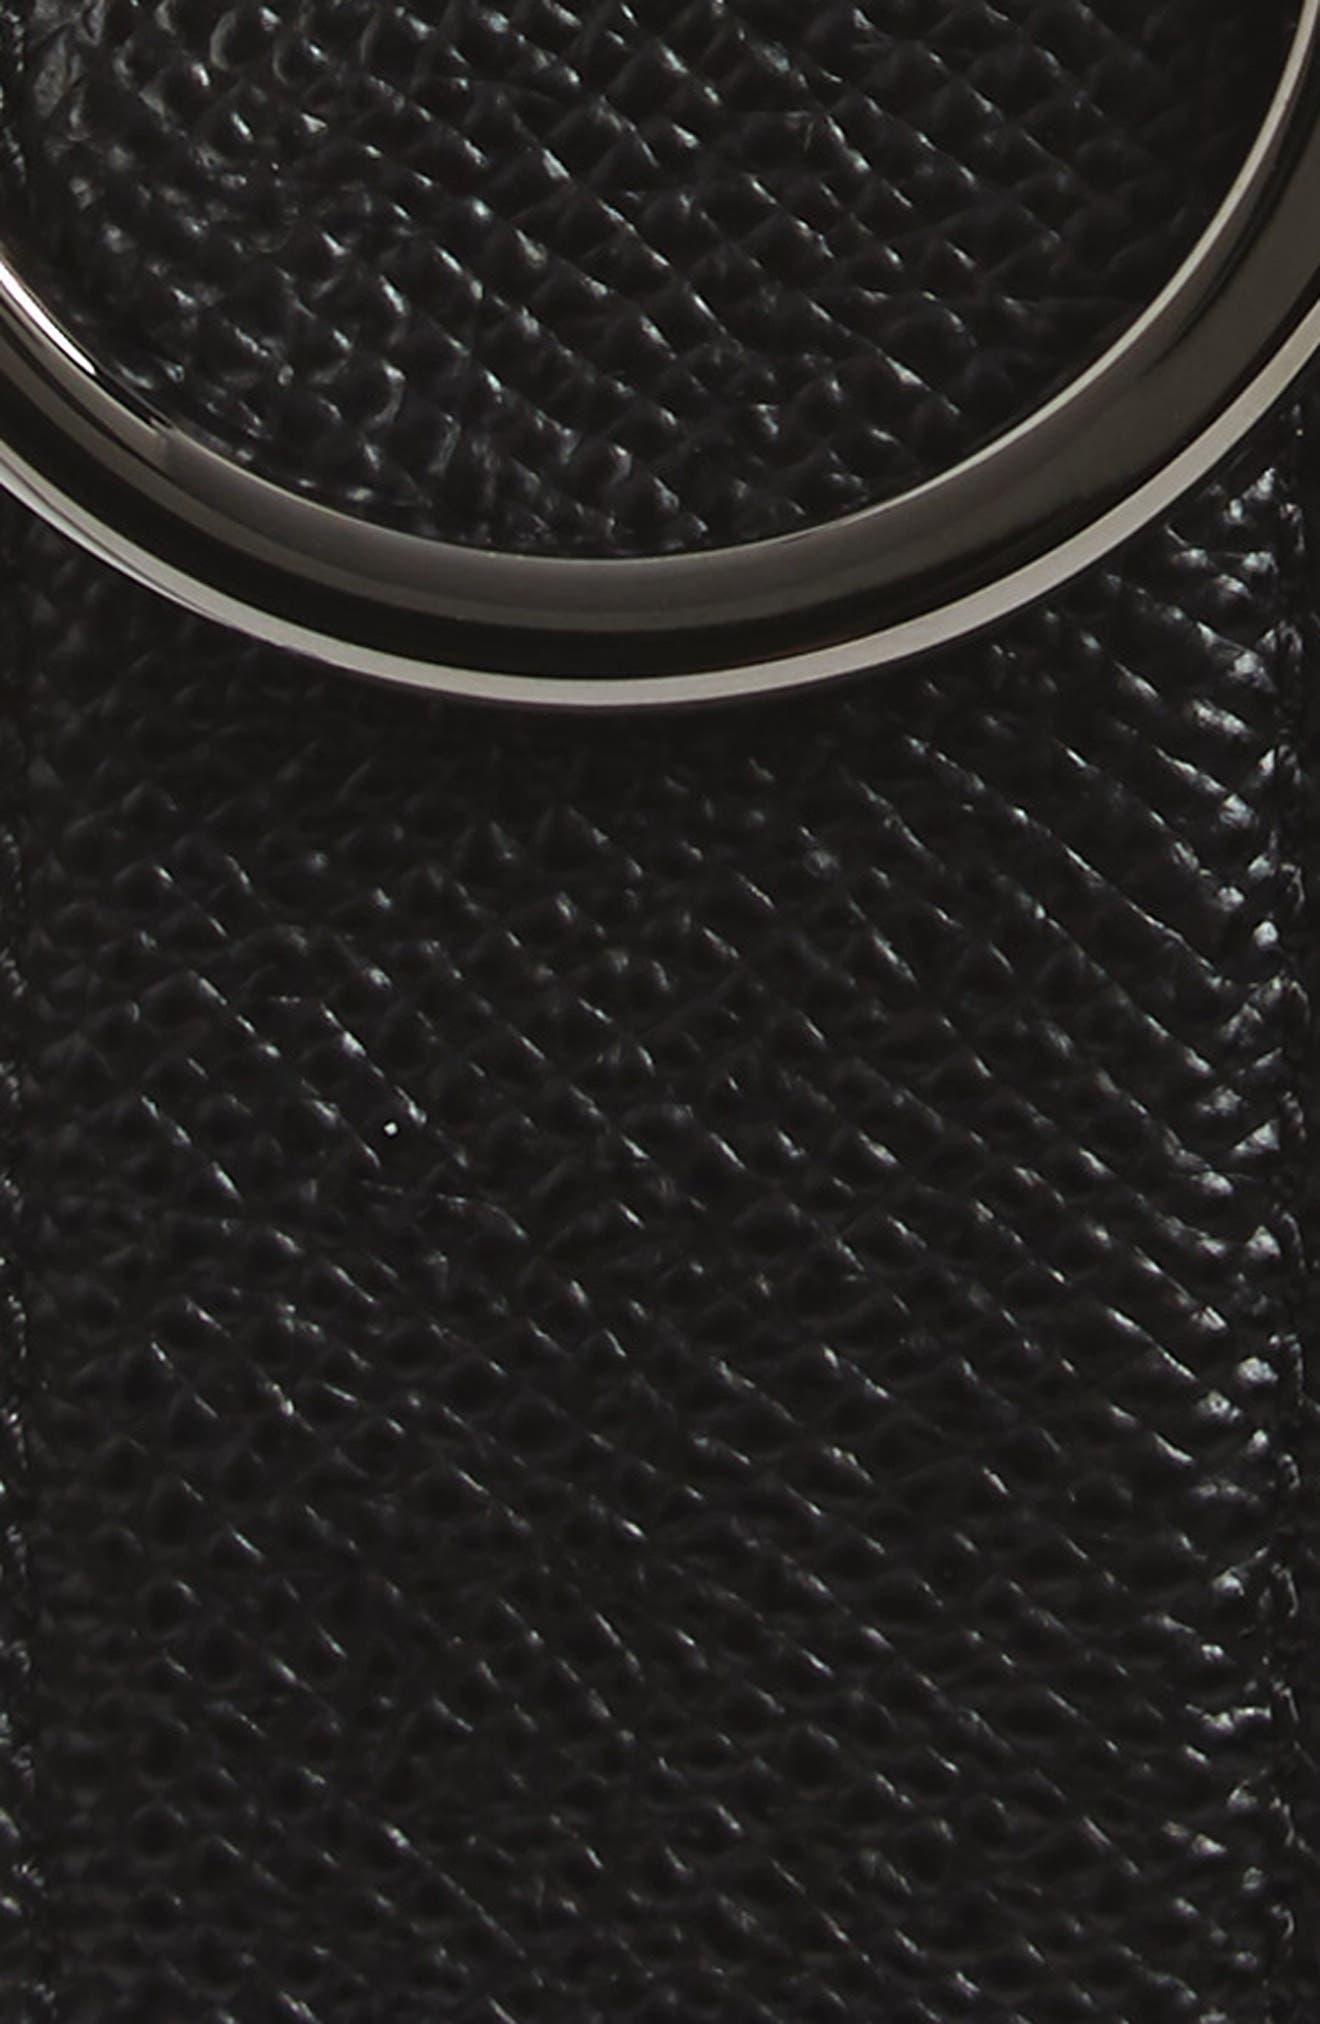 SALVATORE FERRAGAMO, Double Gancio Leather Belt, Alternate thumbnail 2, color, BLACK/ T MORO